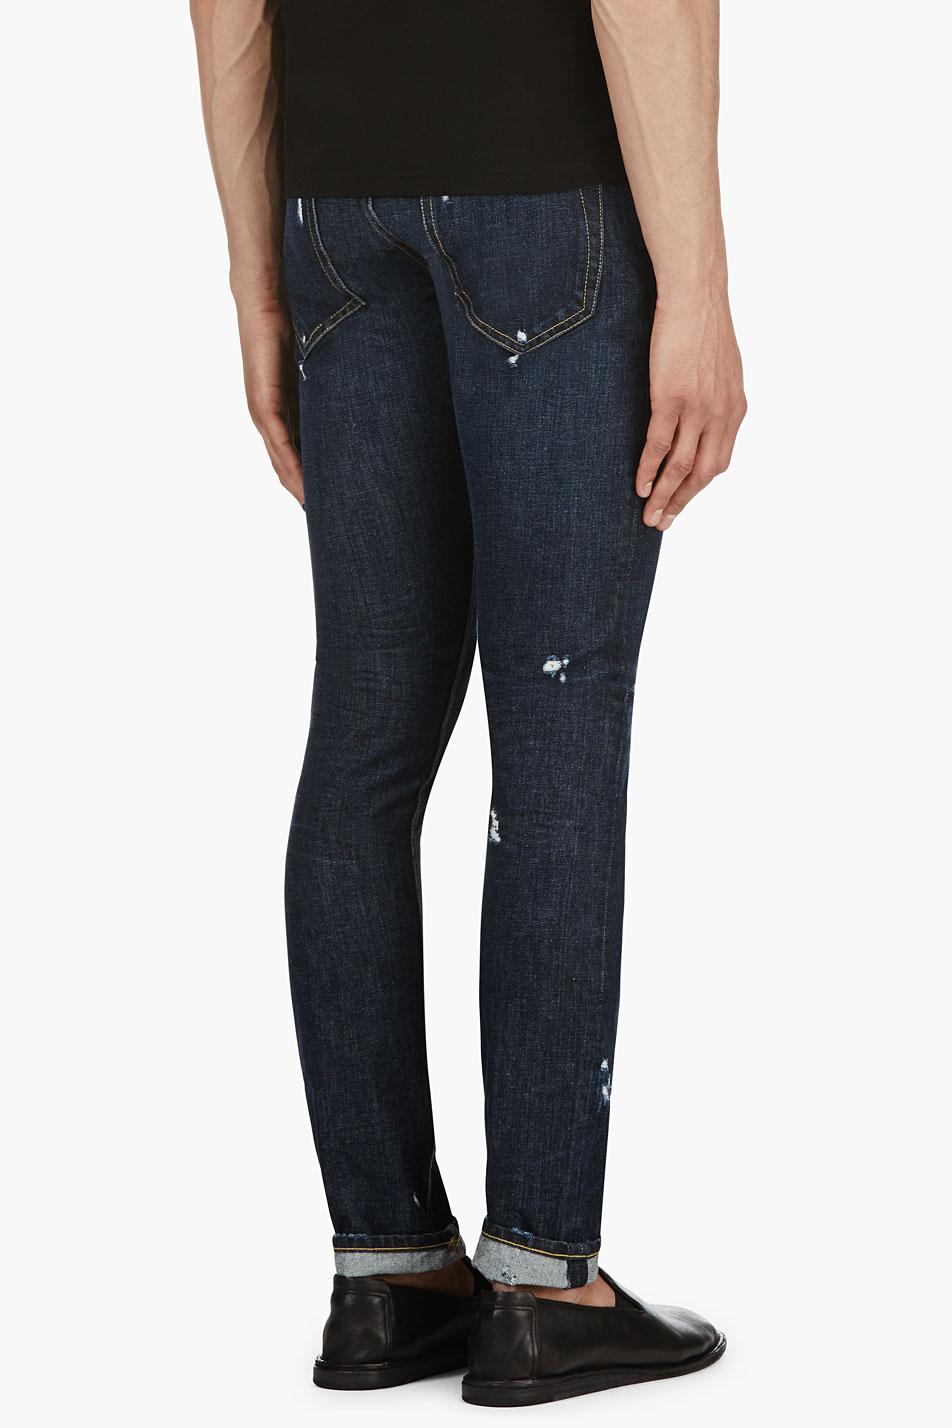 Distressed Black Jeans Mens